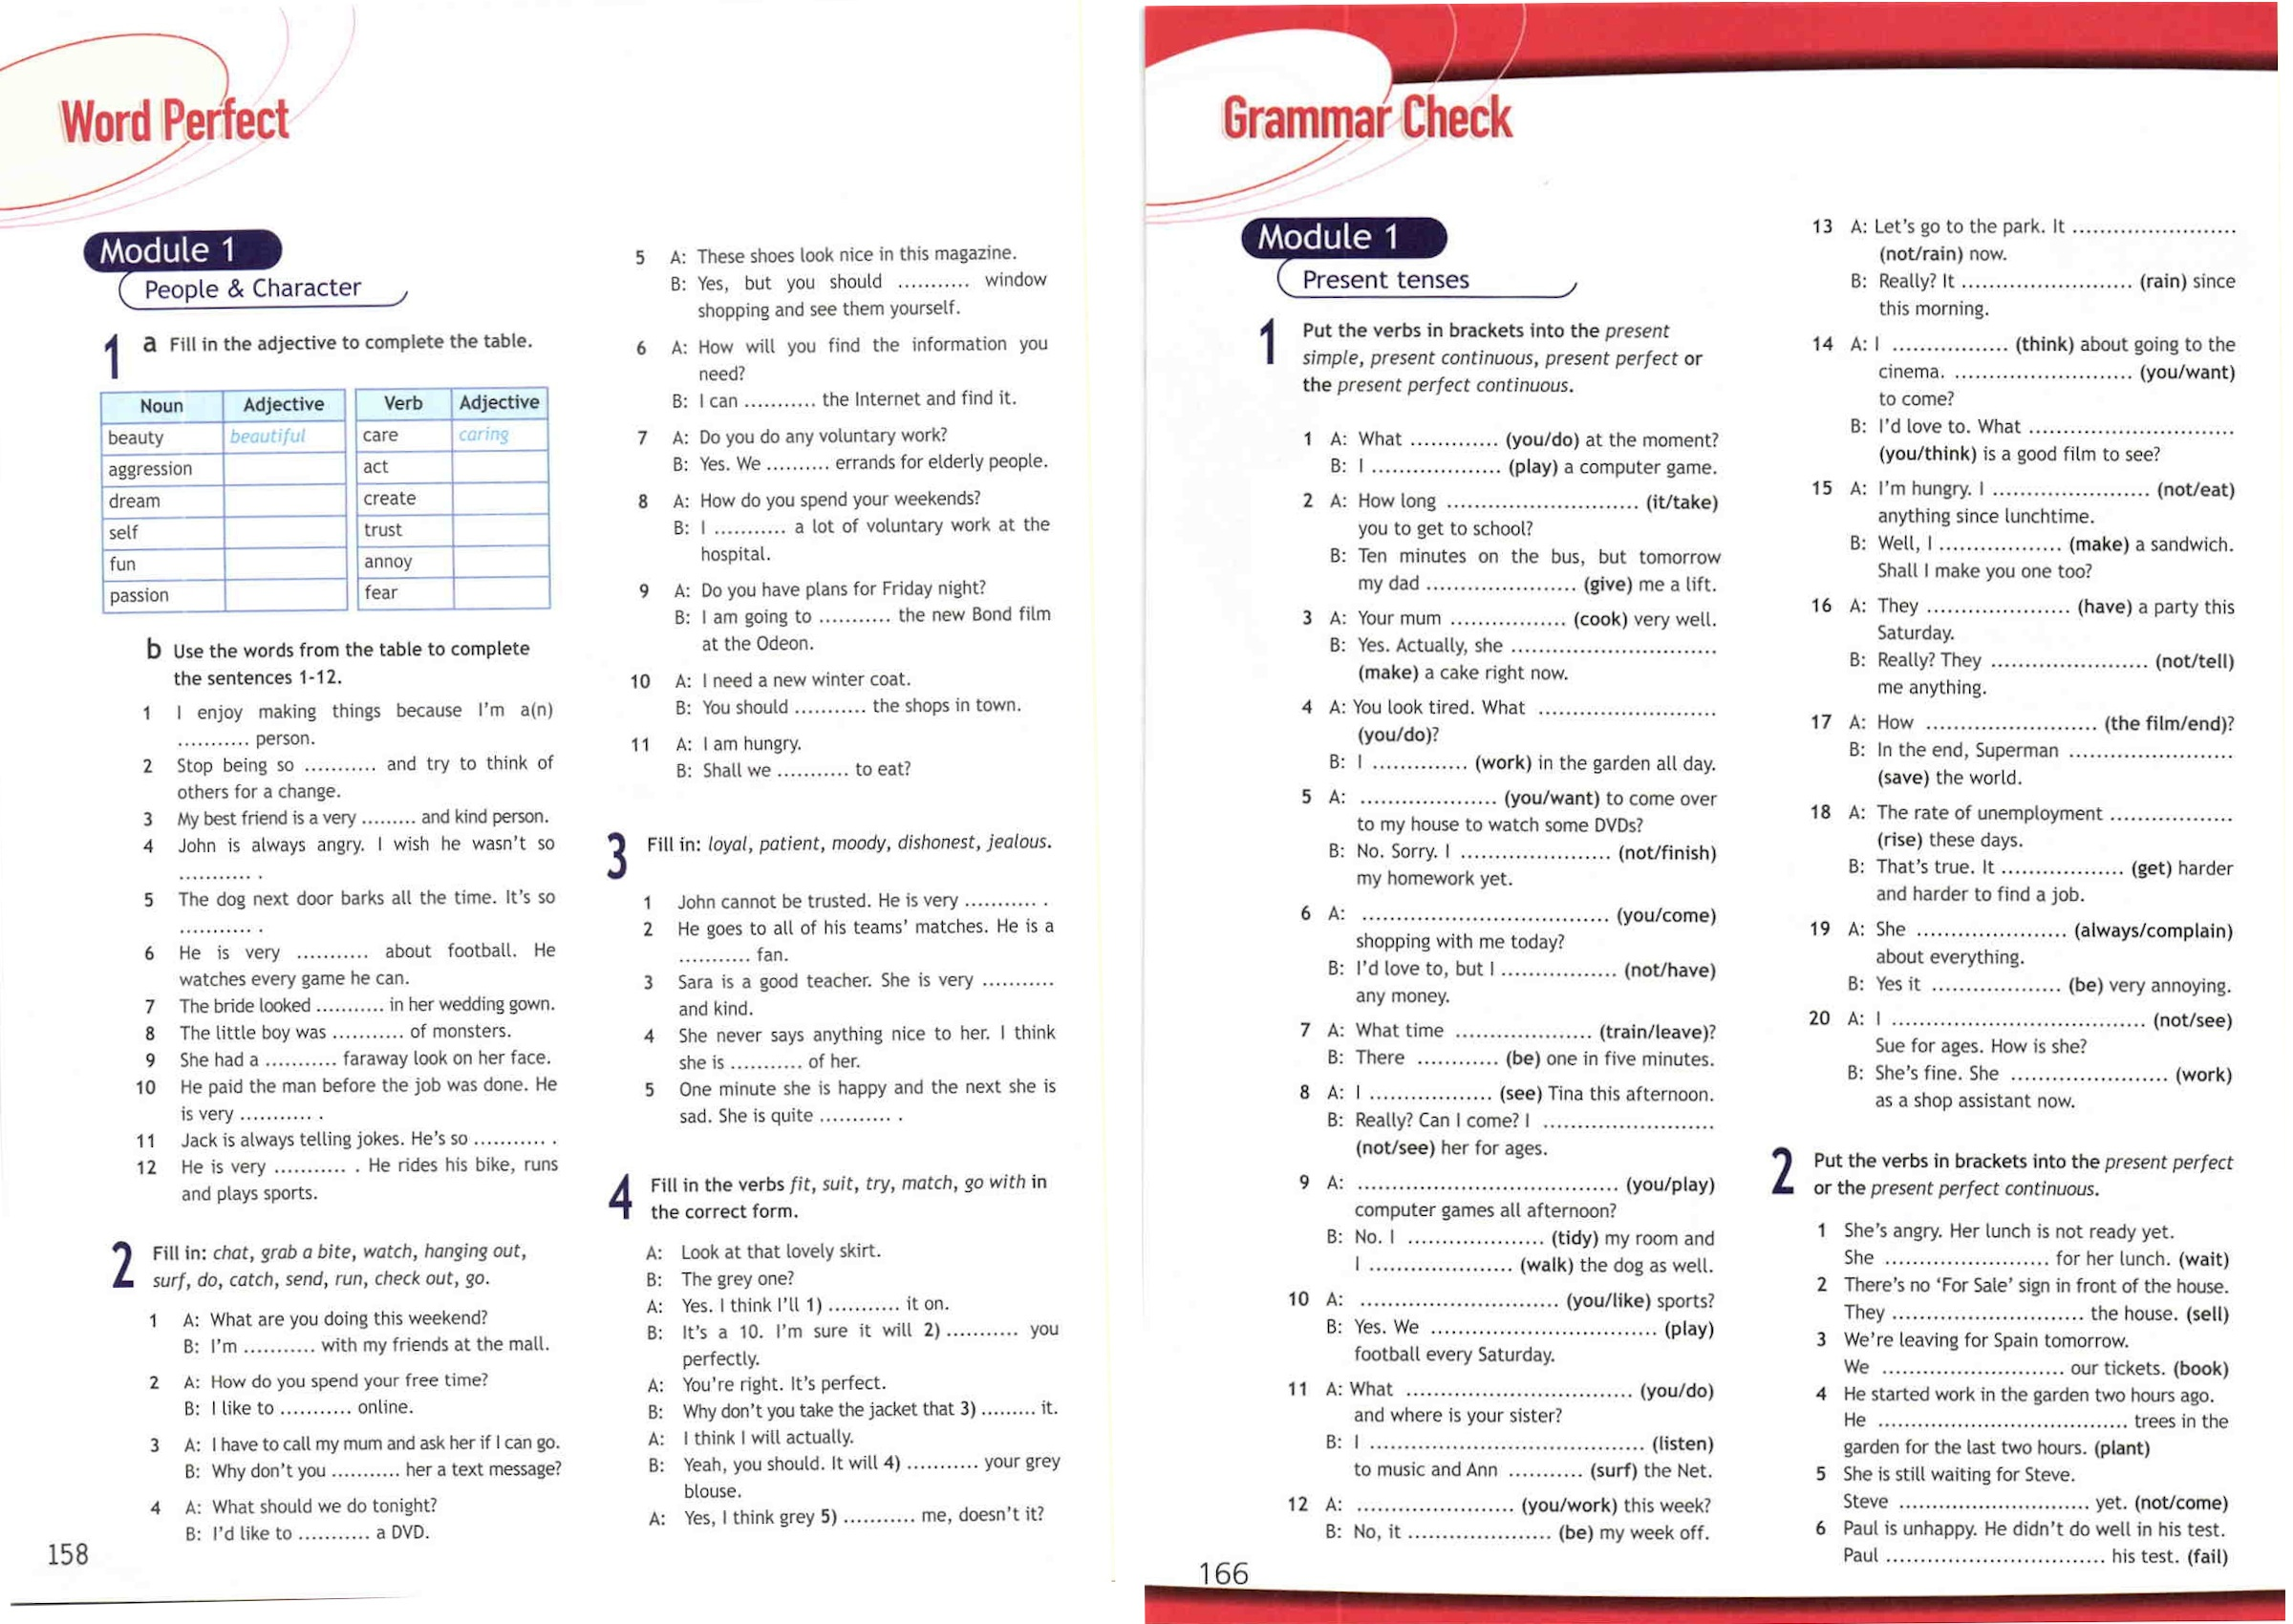 Учебник Spotlight, раздел Word Perfect & Grammar Check